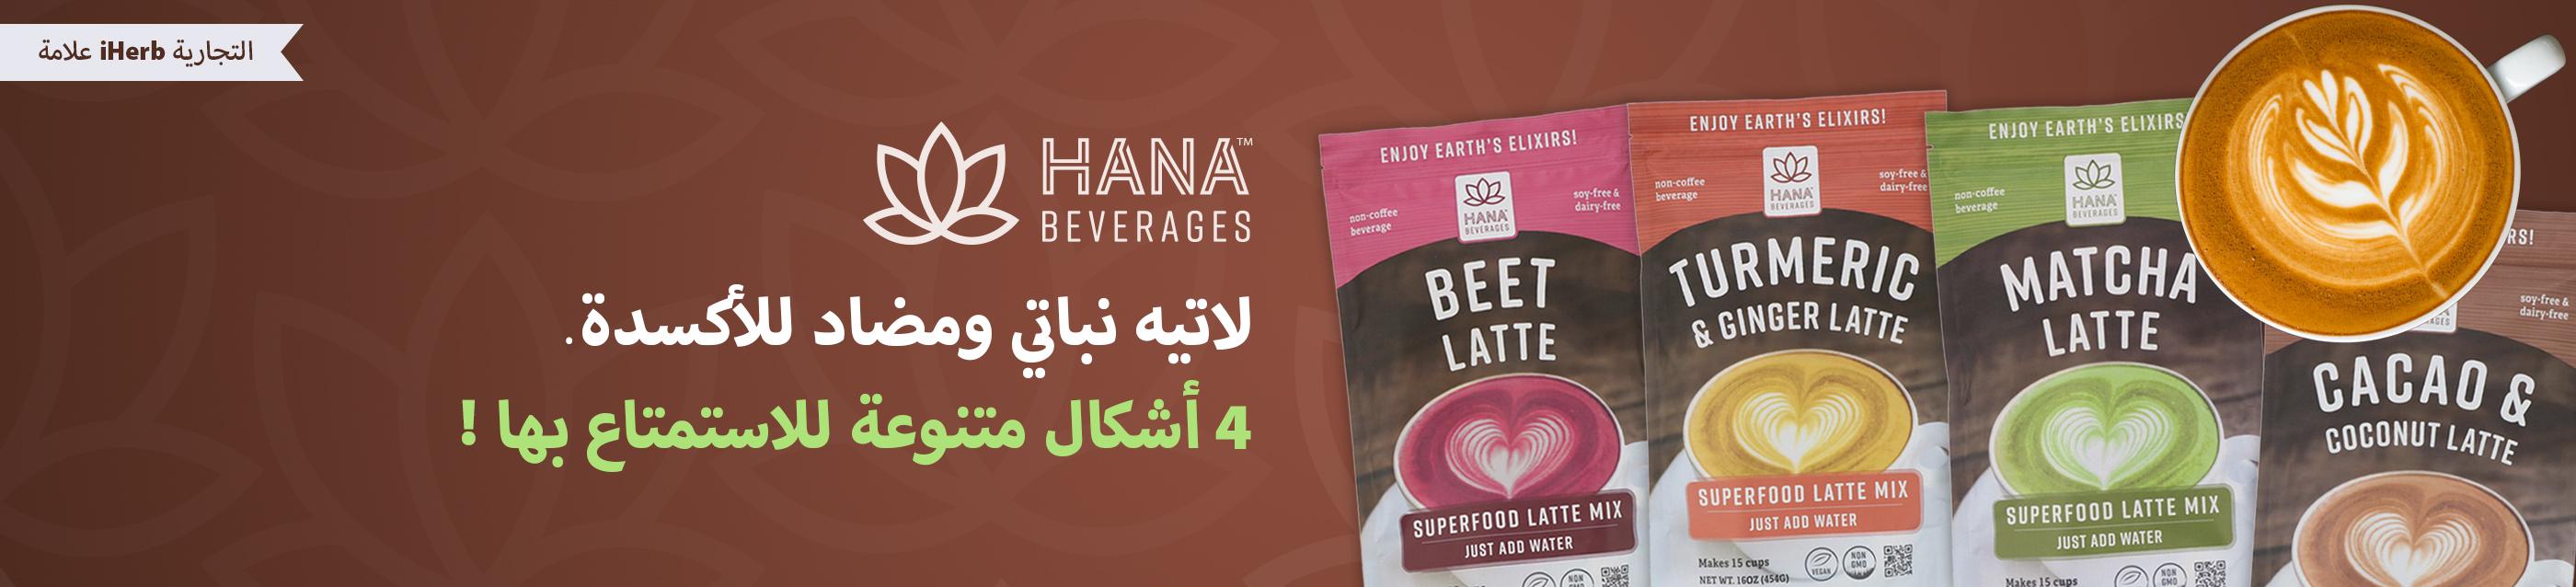 Hana Beverages